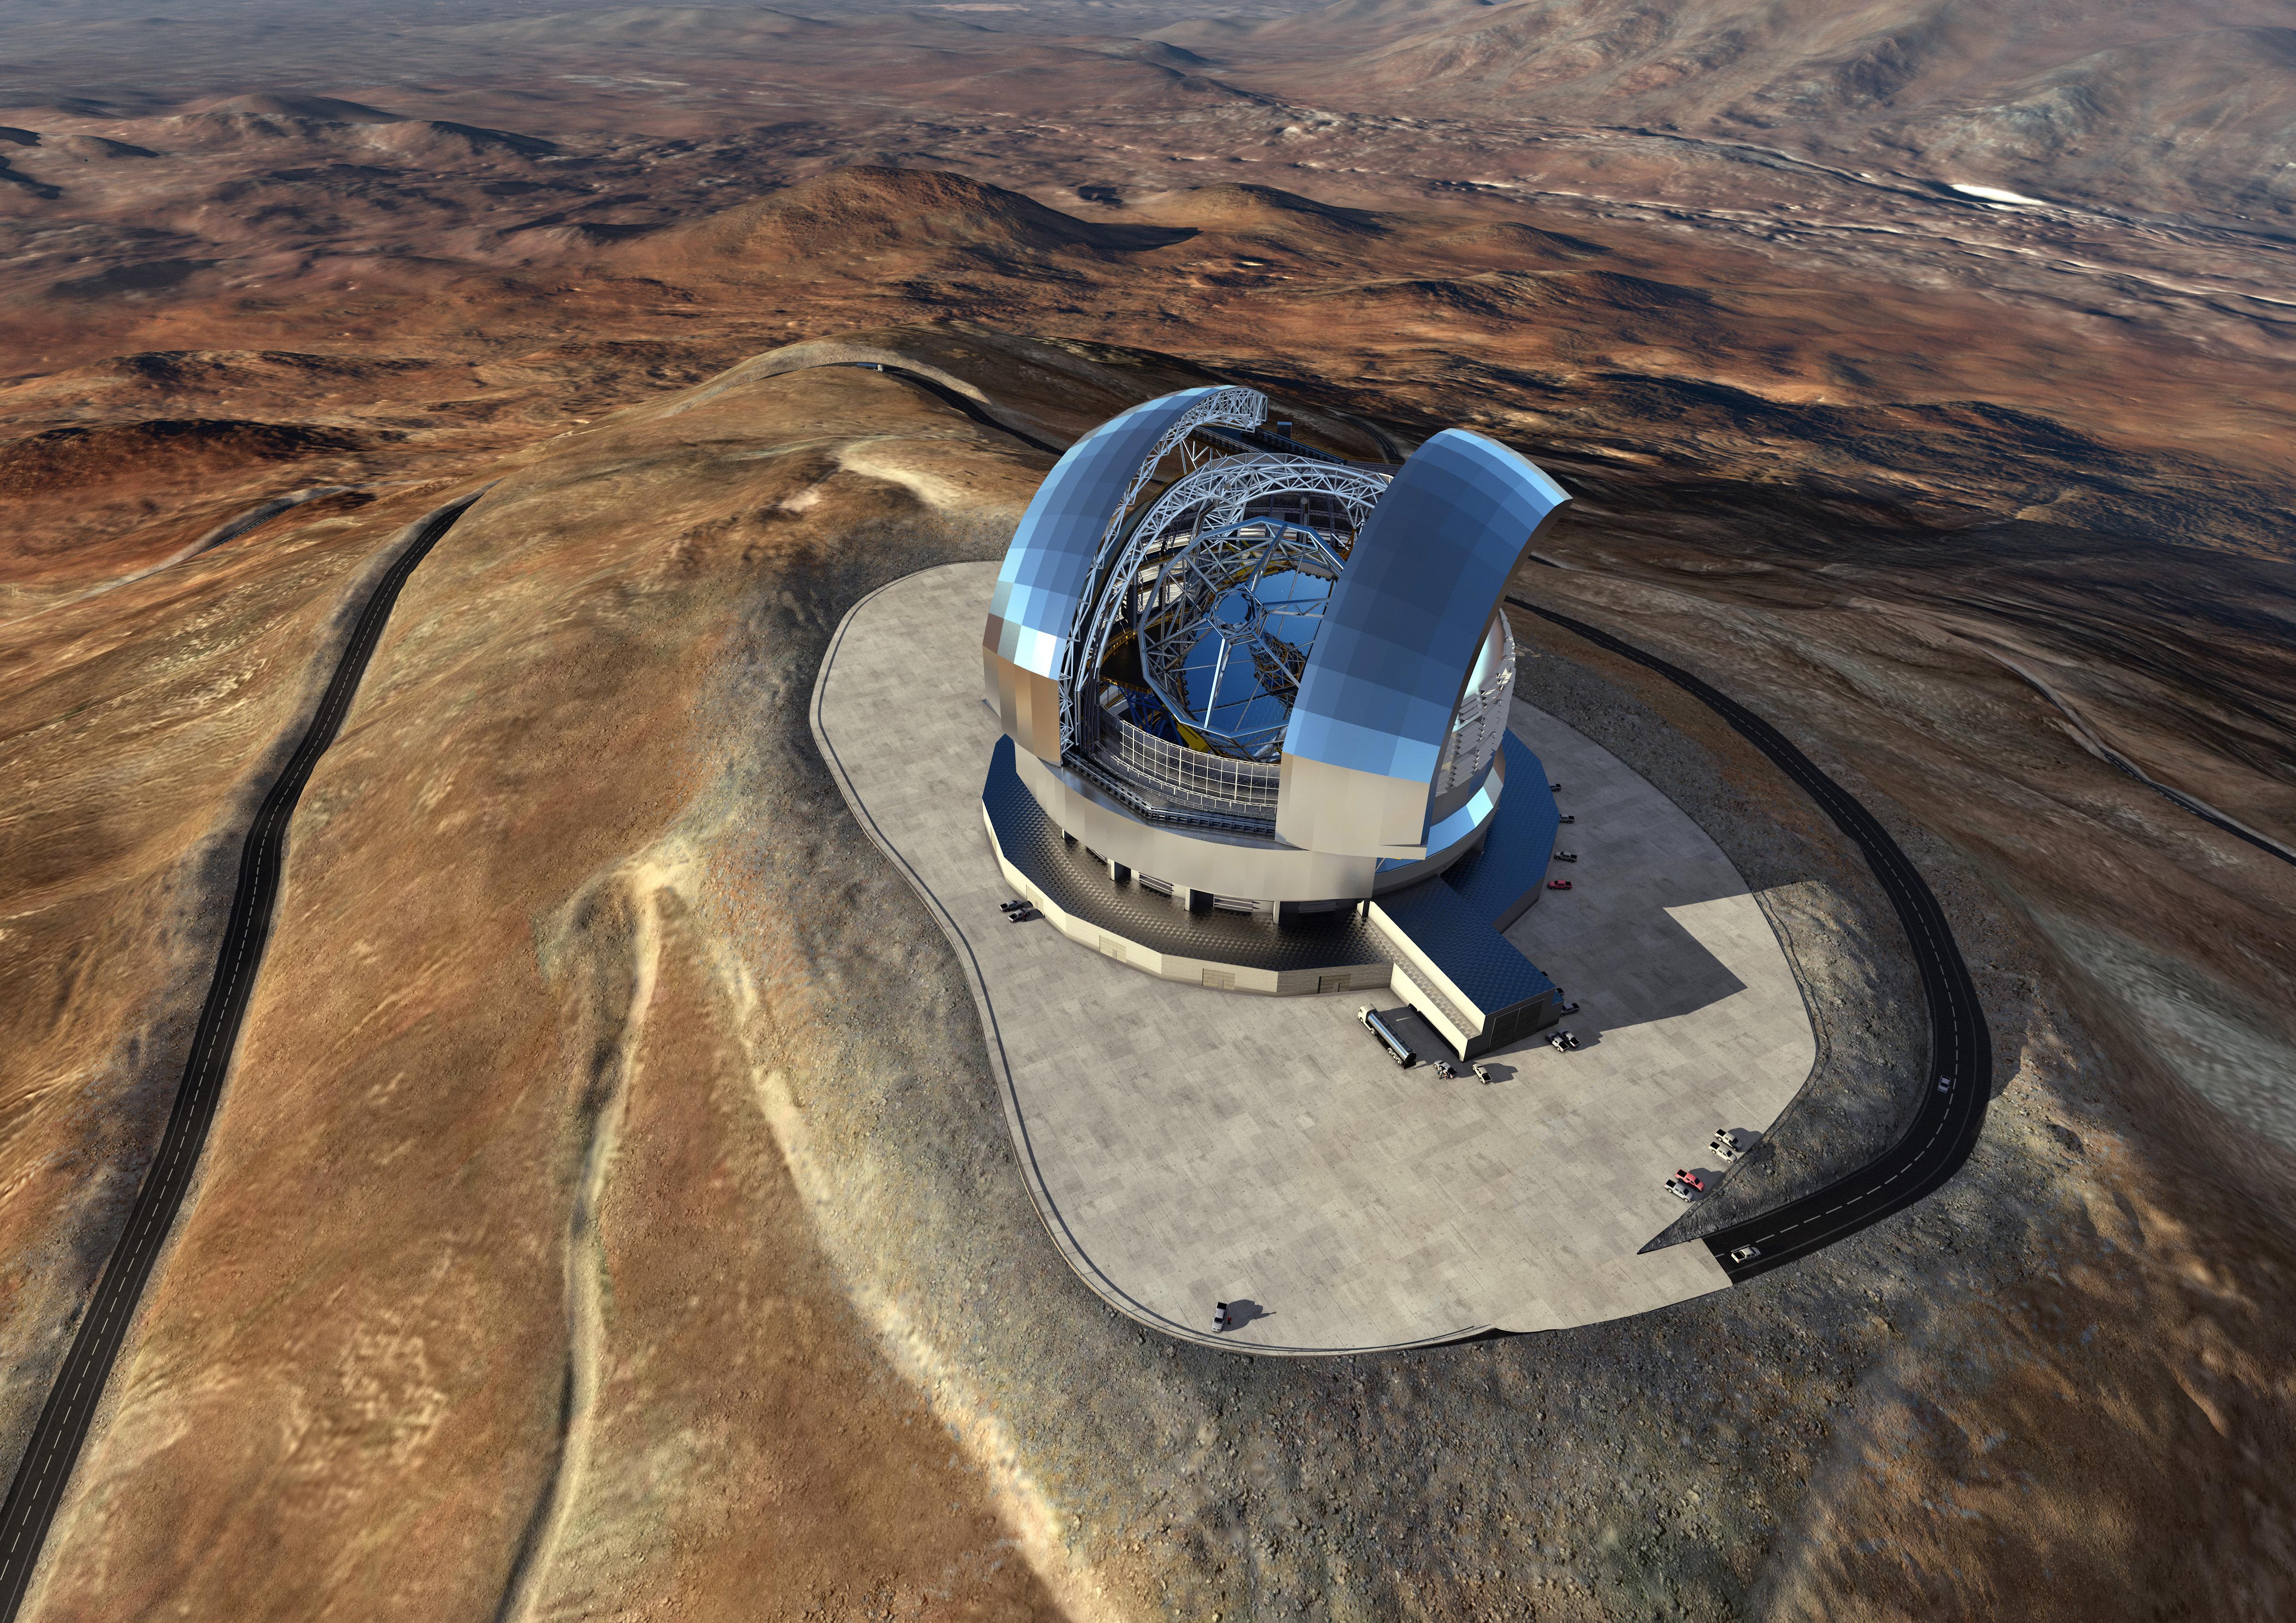 "Чрезвычайно большой телескоп (Extremely Large Telescope), рисунок. Источник: <a href=""https://www.eso.org/public/images/eso1617e"" target=""_blank"">ESO</a>."